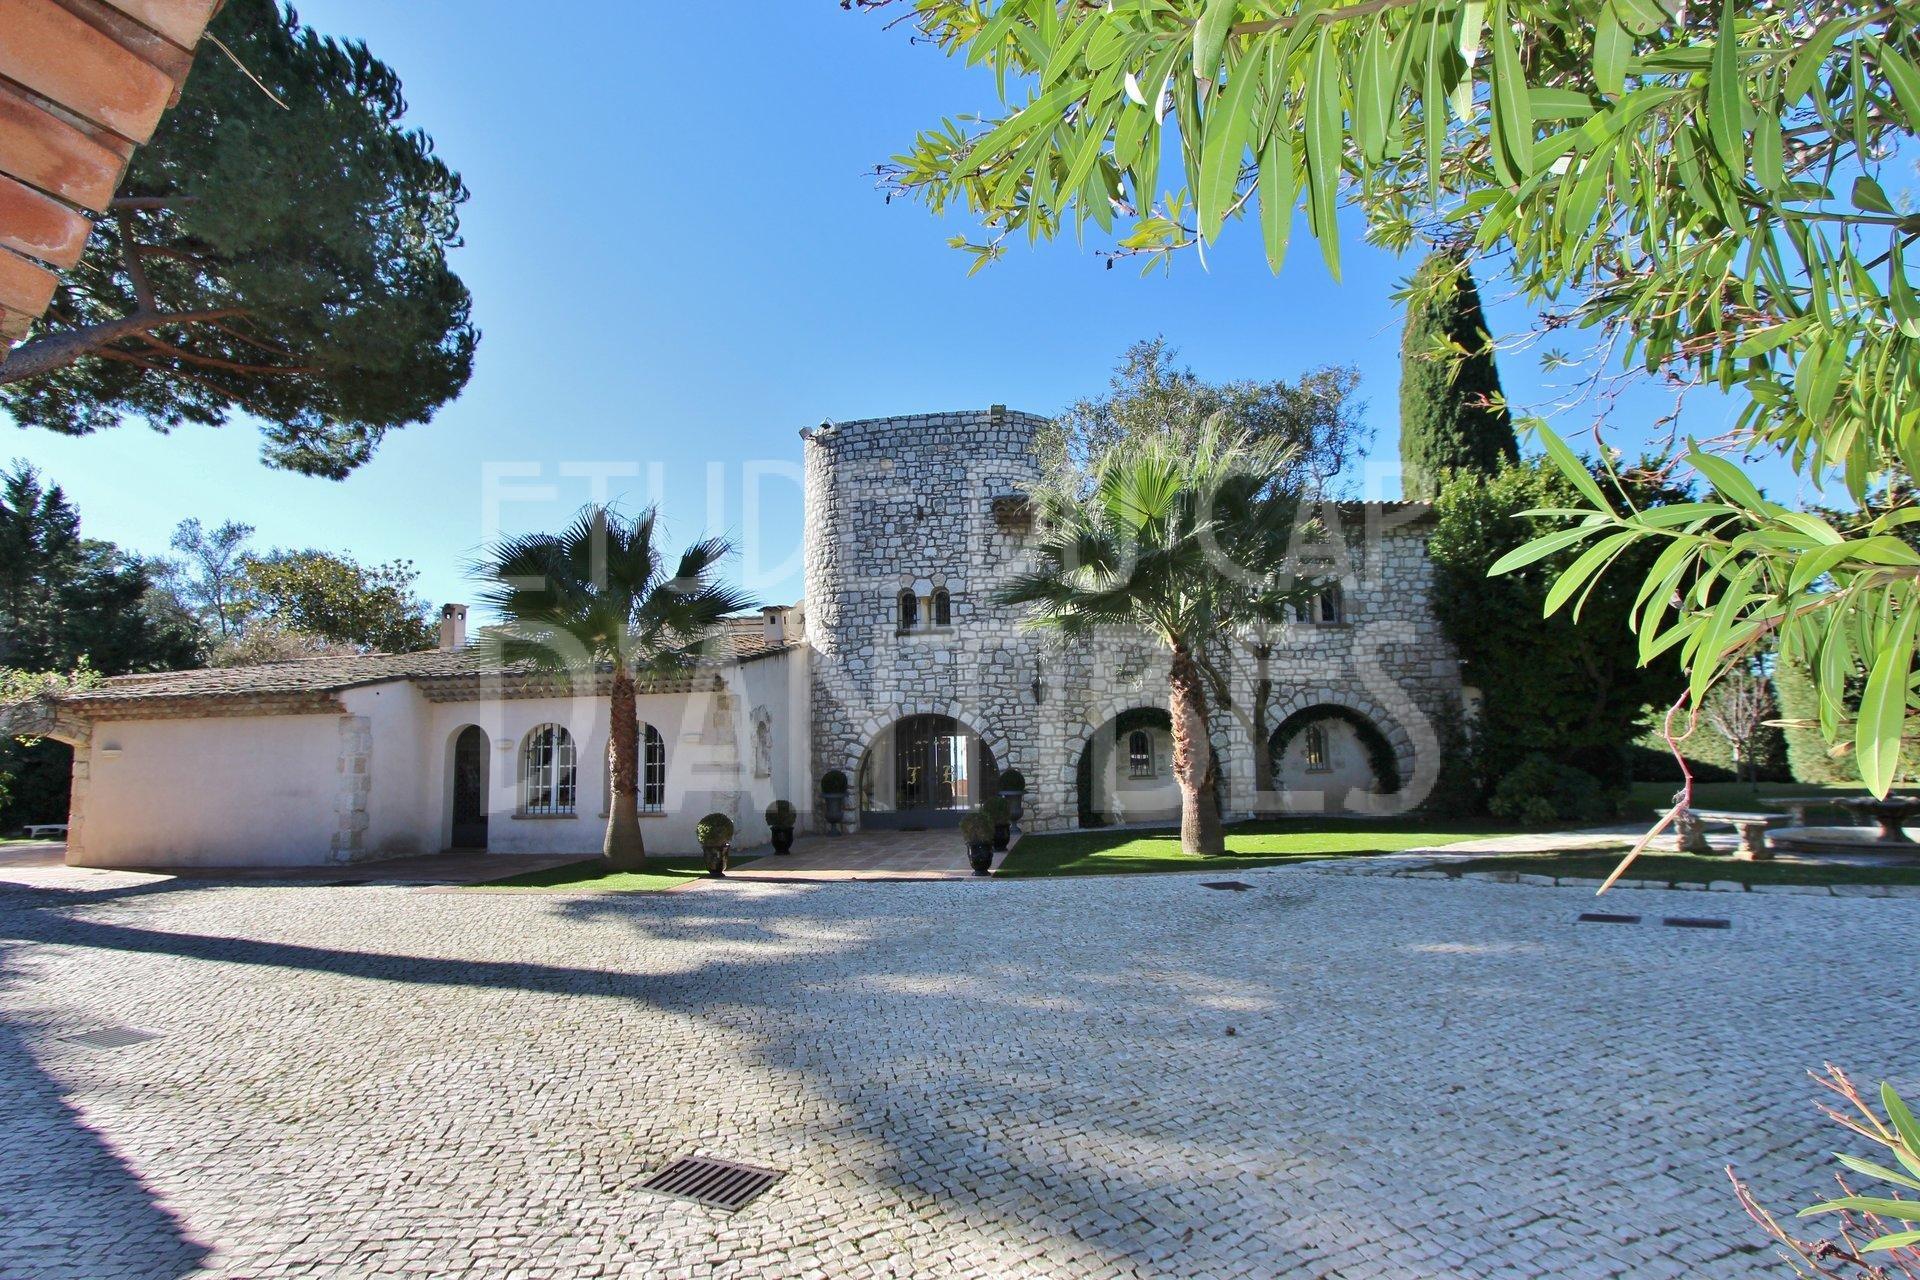 Affitto stagionale Proprietà - Cap d'Antibes